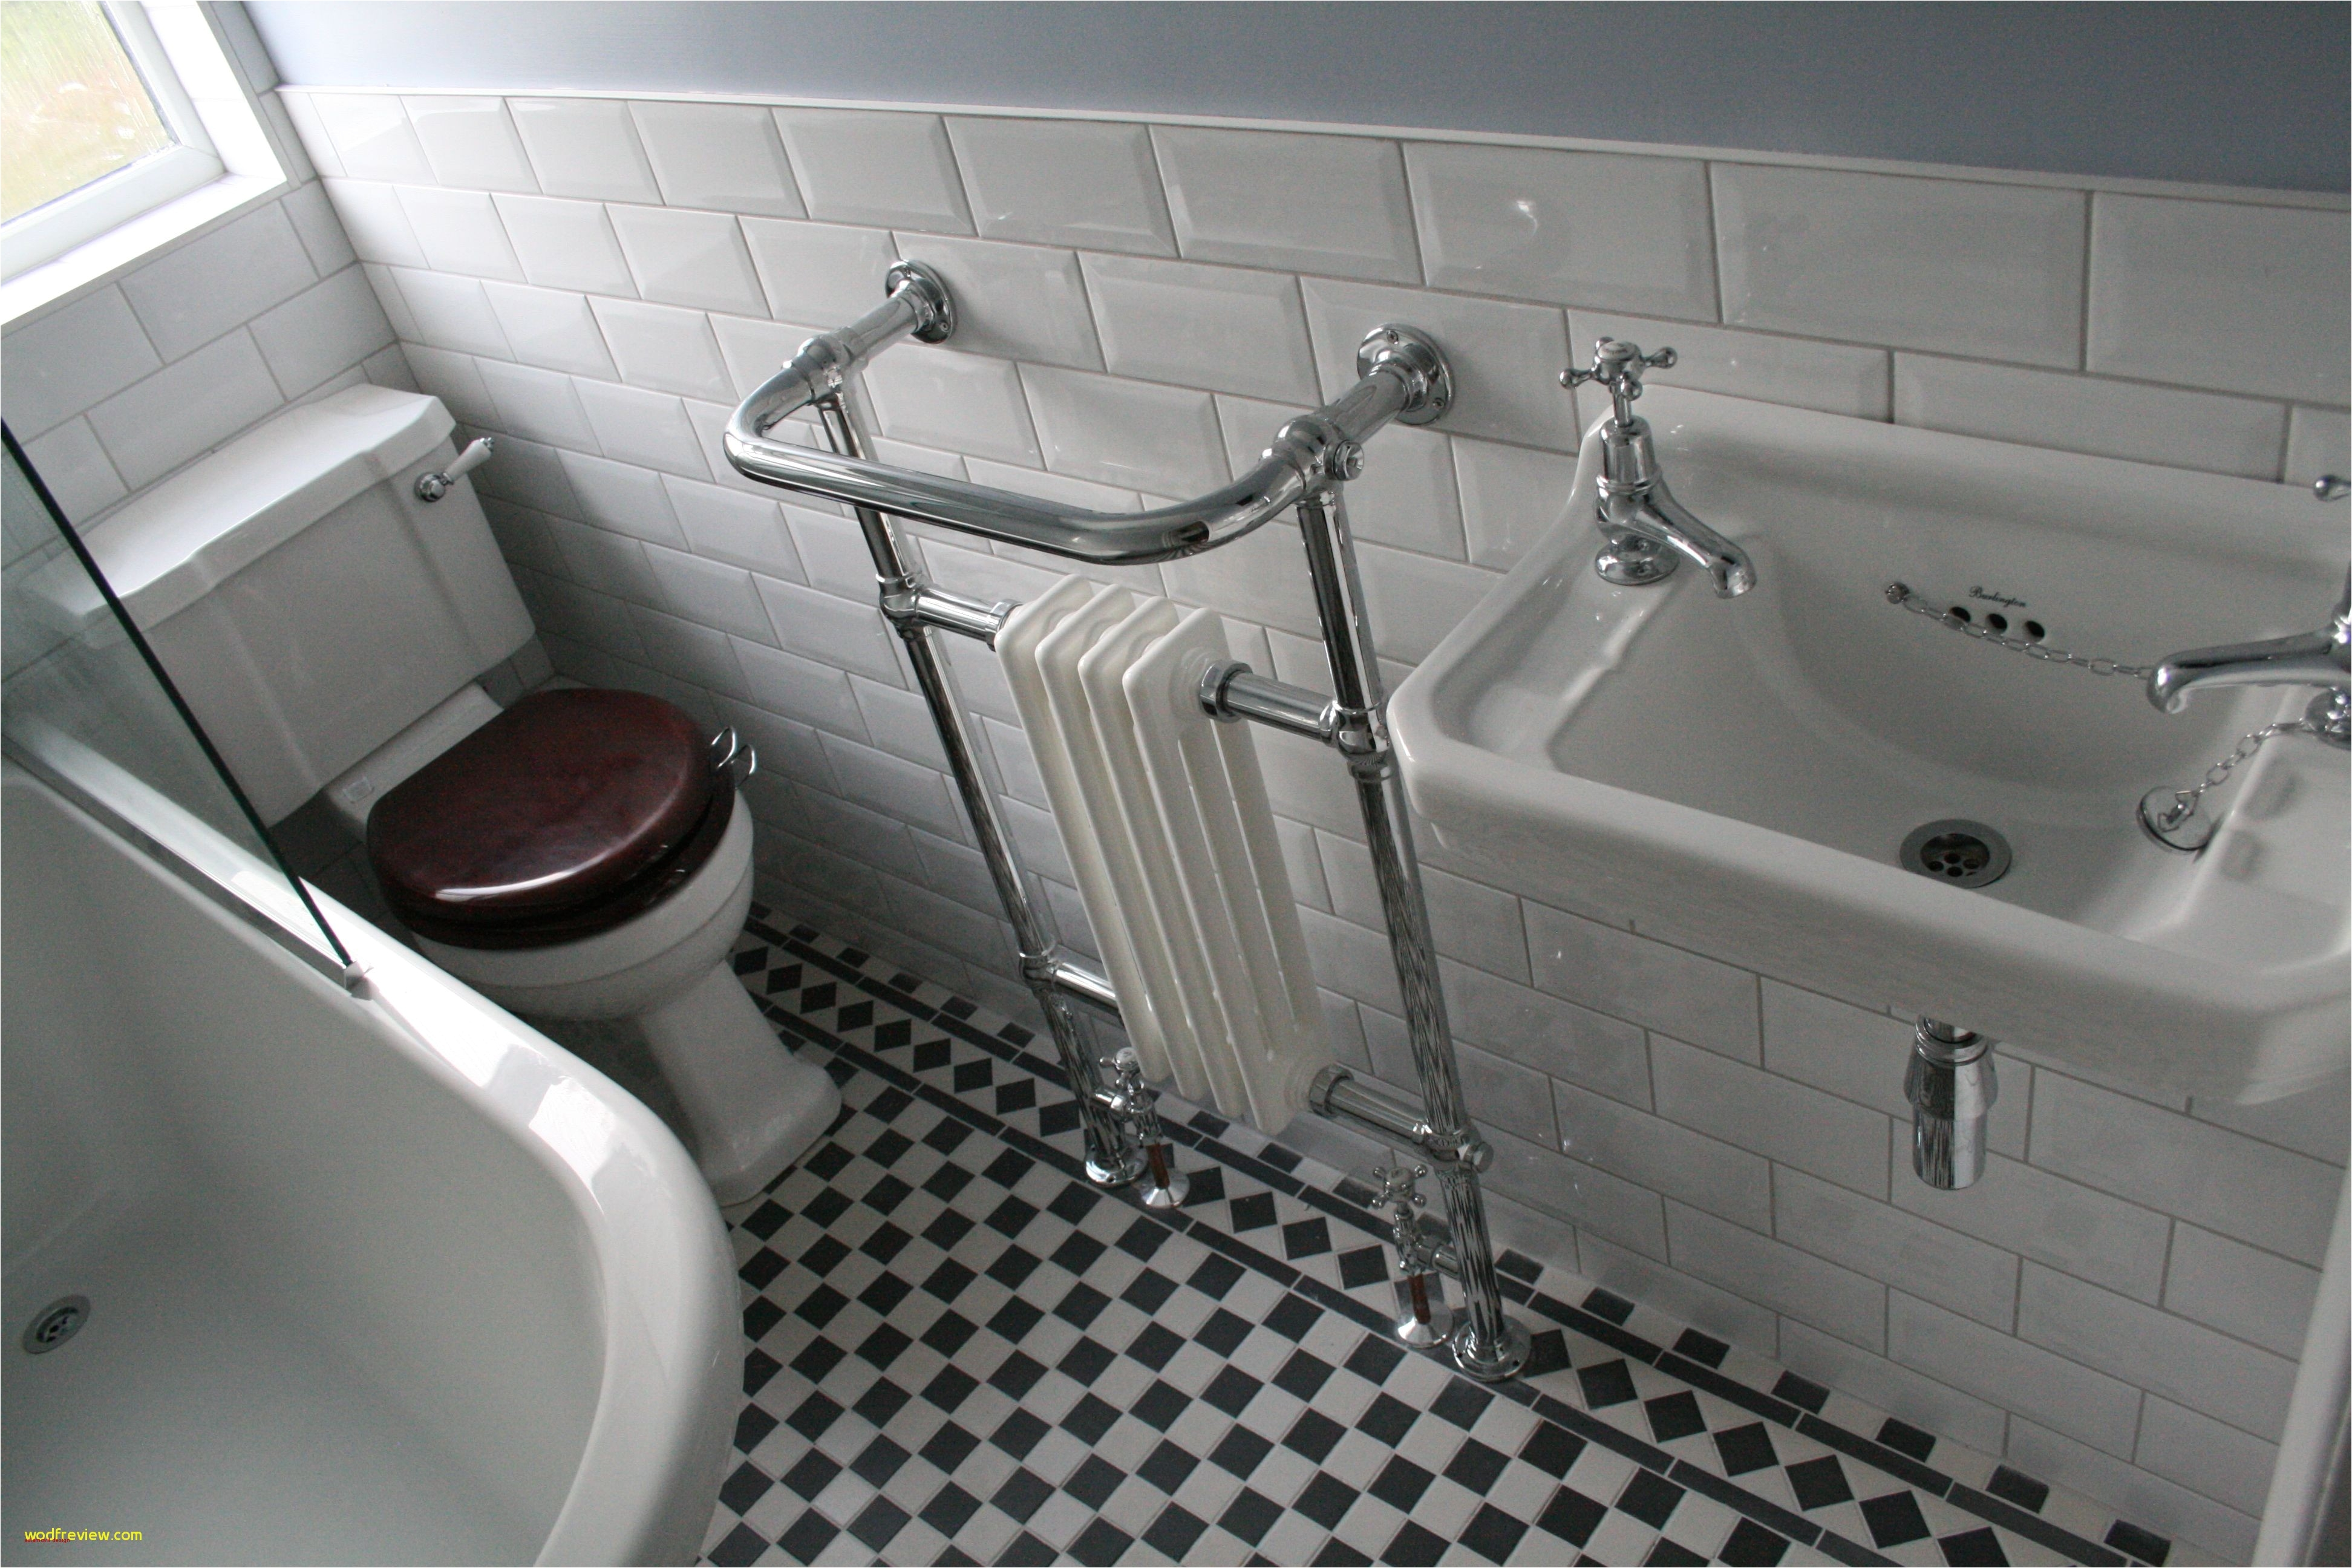 Luxury Bathroom Design Ideas Inspirational Purple and Gray Bathroom Ideas